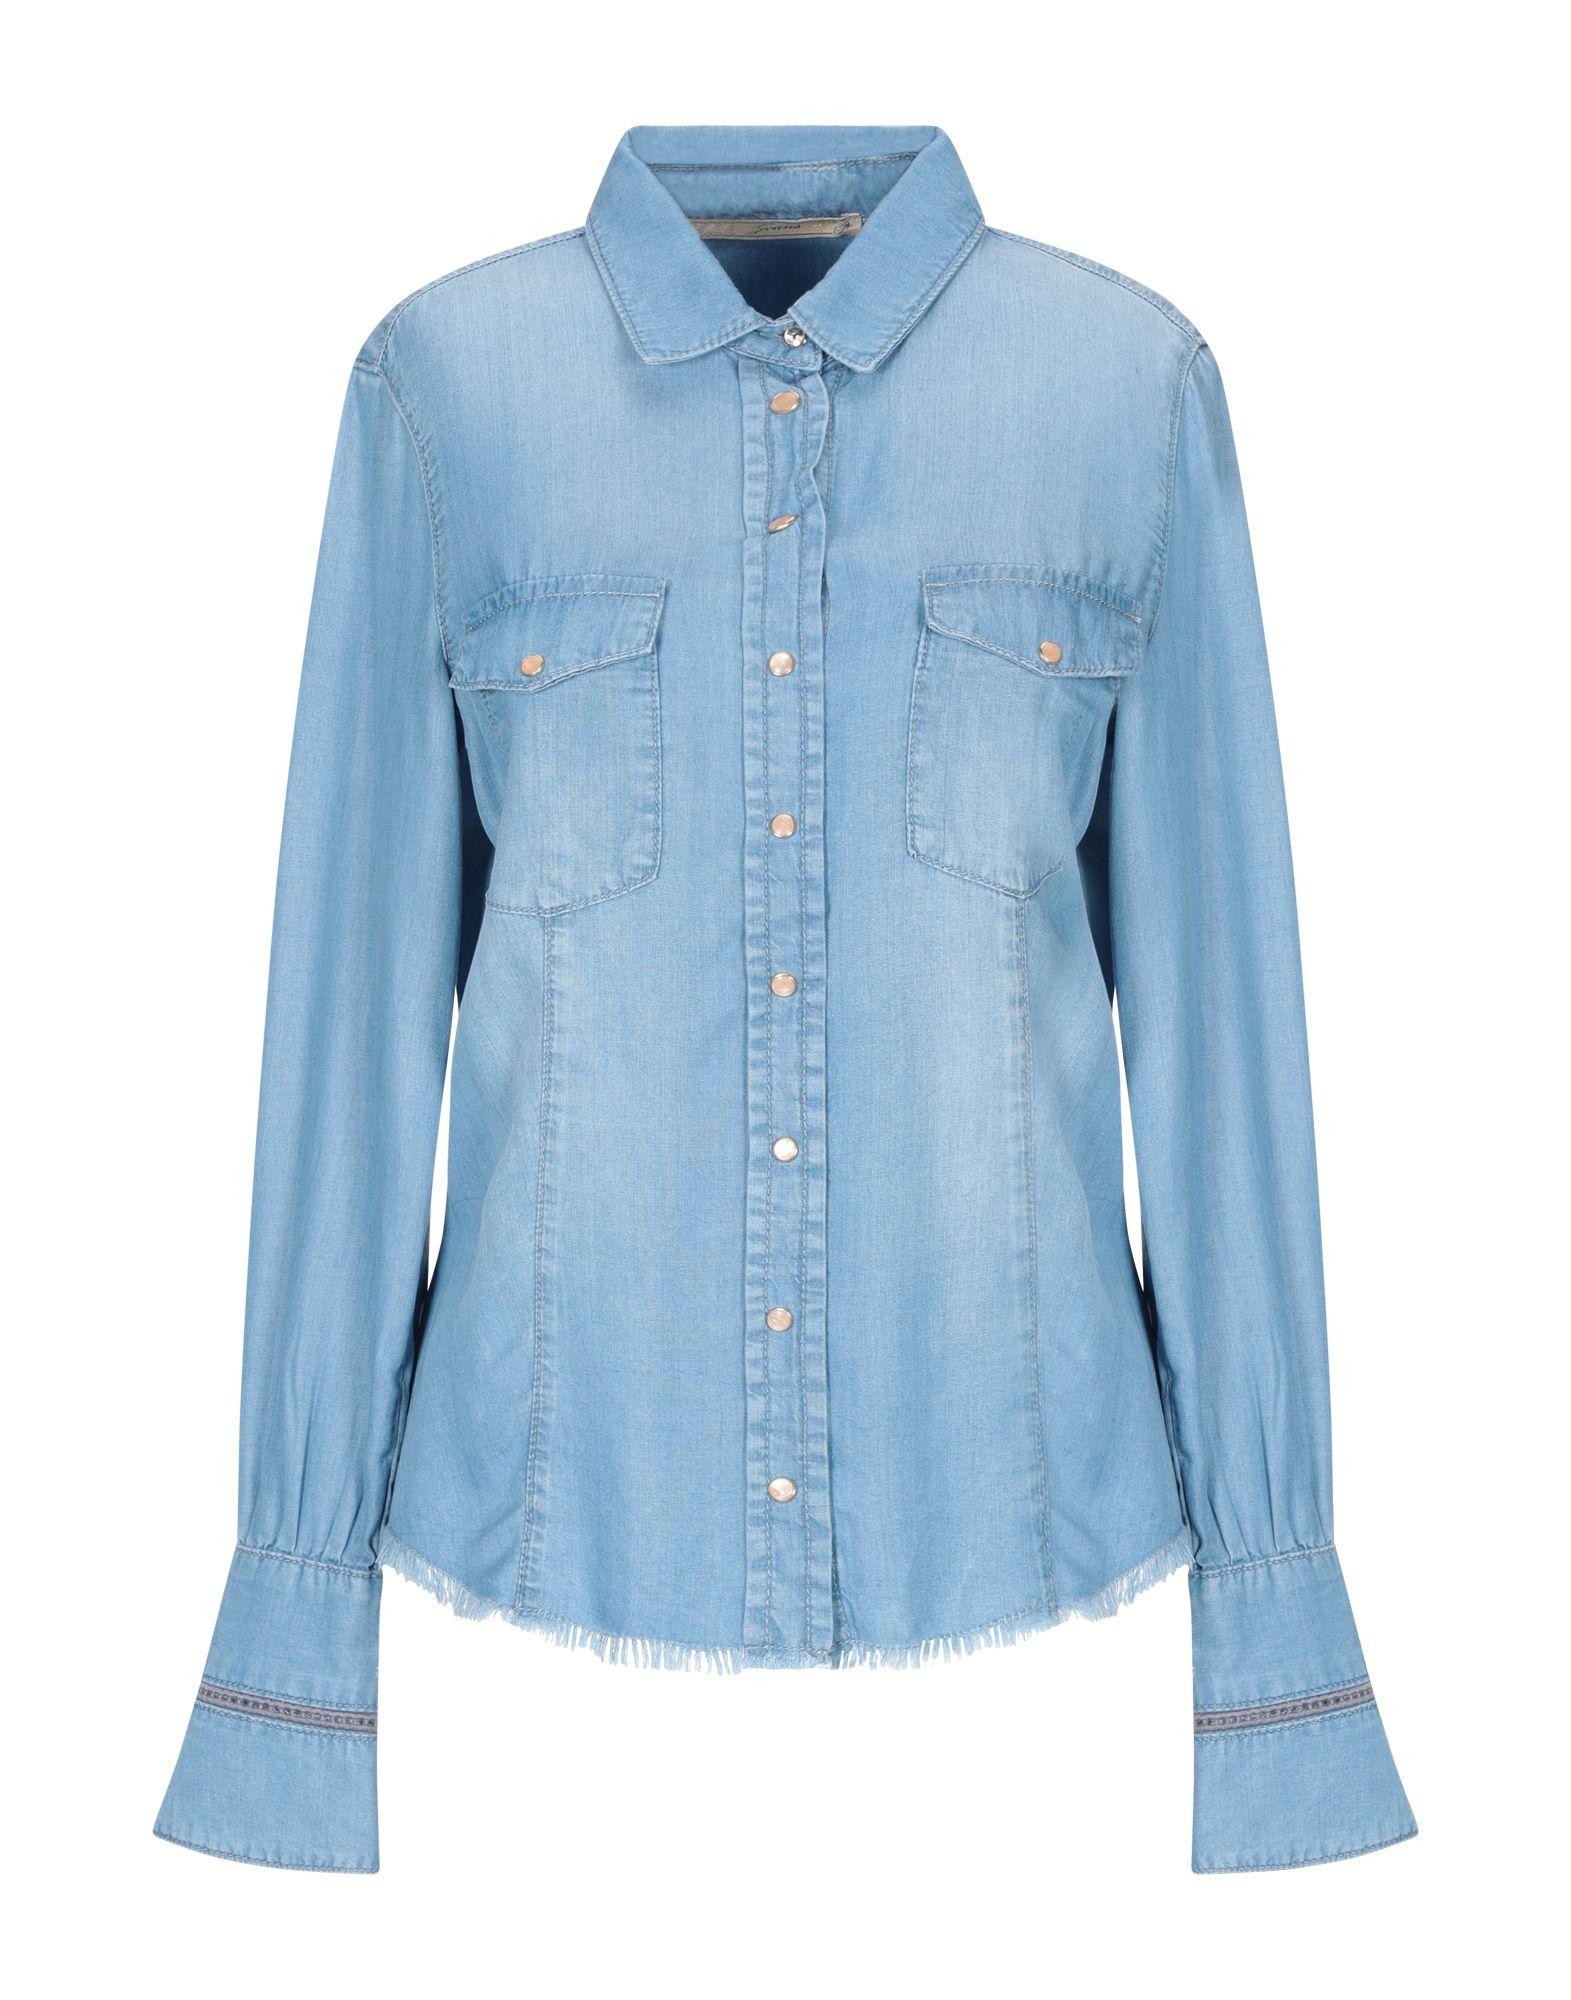 PATRIZIA PEPE Джинсовая рубашка рубашка patrizia pepe patrizia pepe pa748ewgkaq5